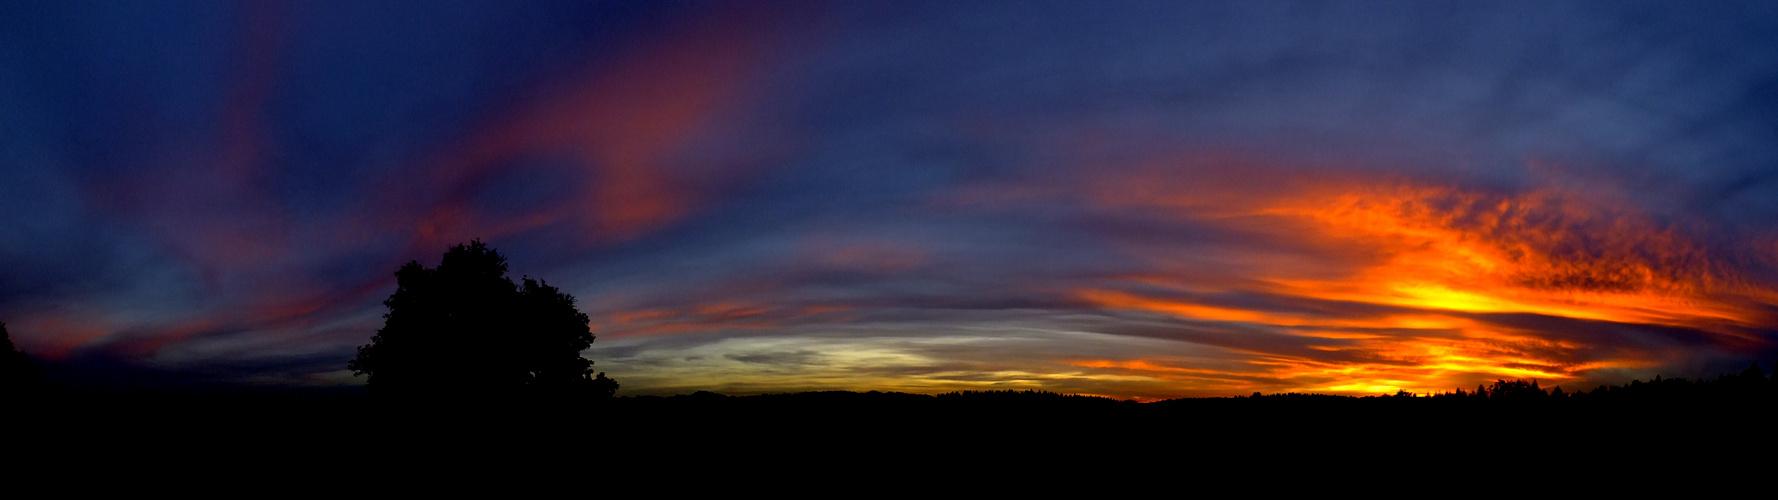 Sonnenuntergang Pano